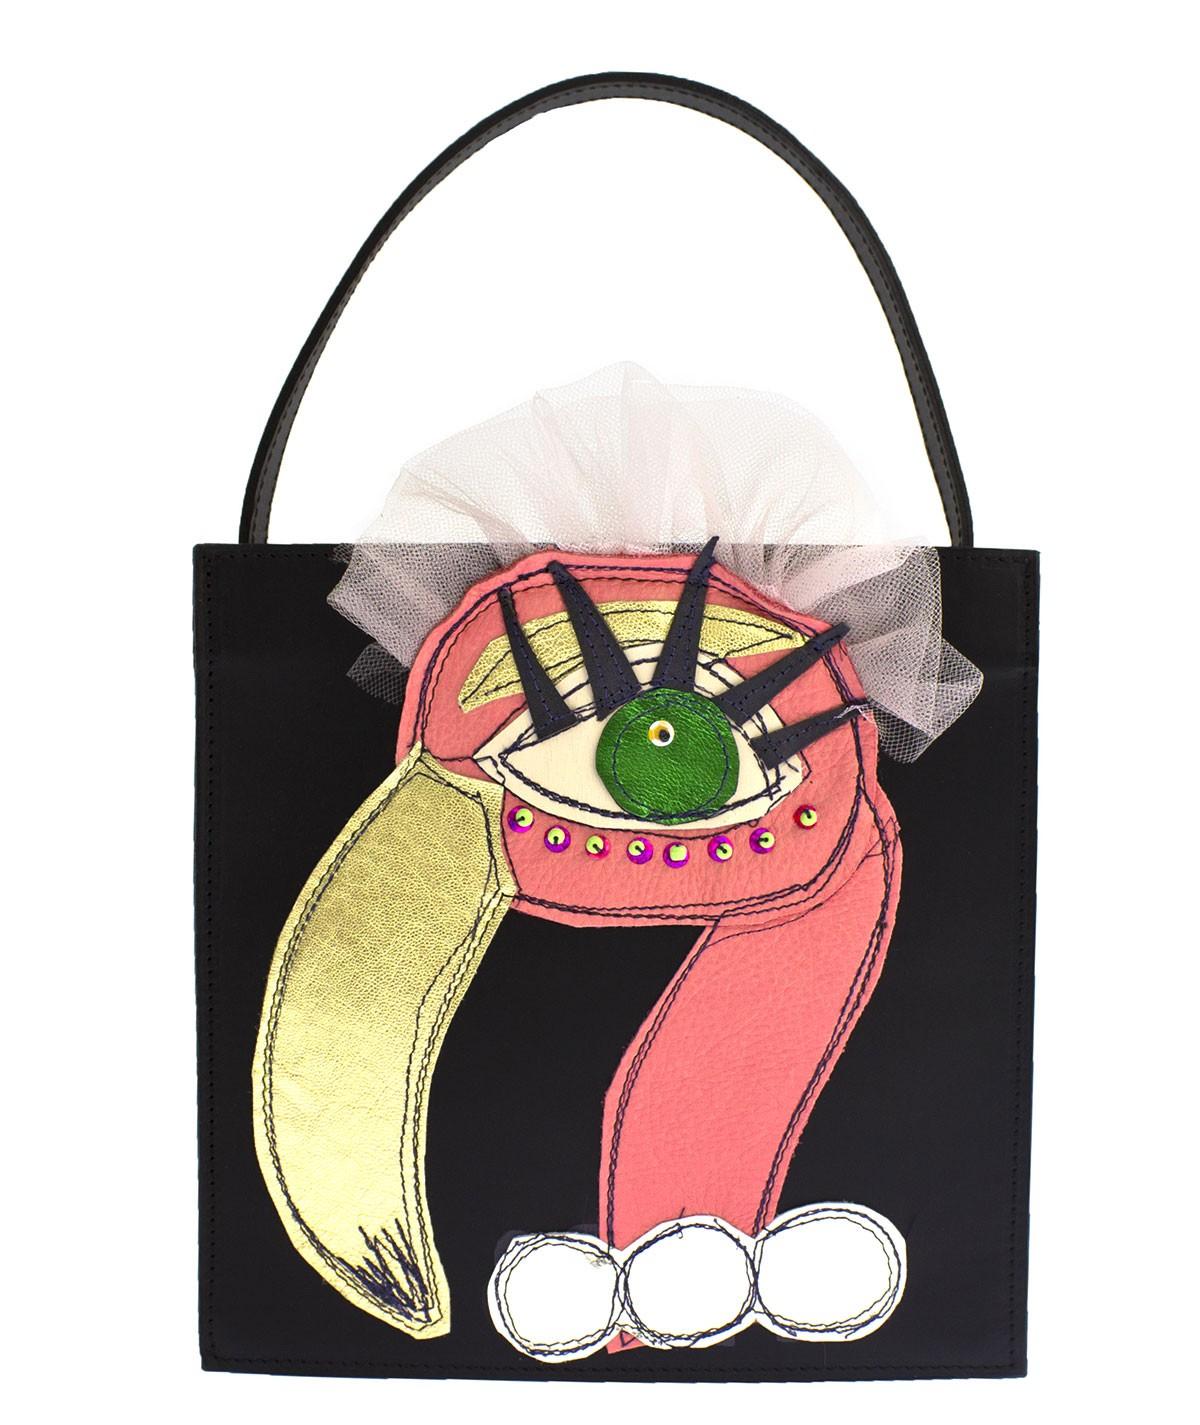 Flamingo - leather handbag